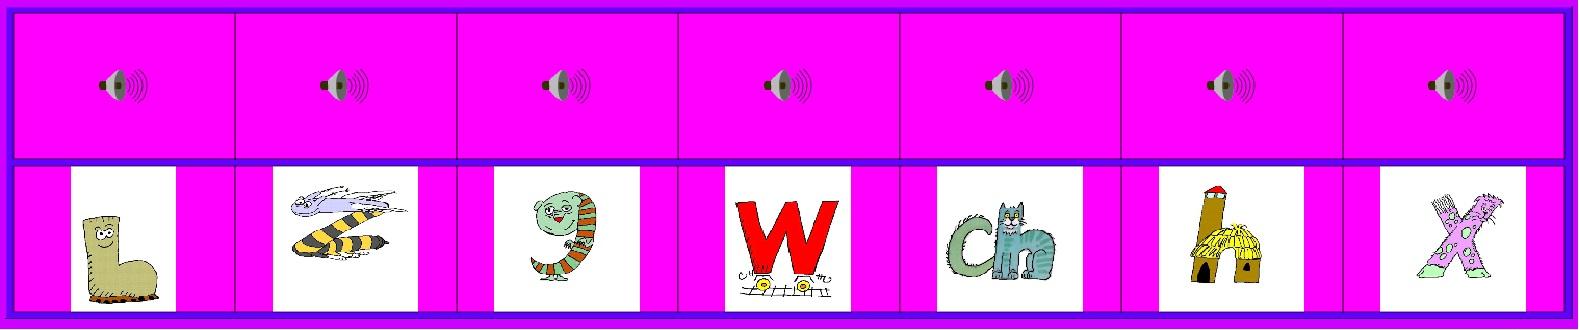 exercice avec consonnes